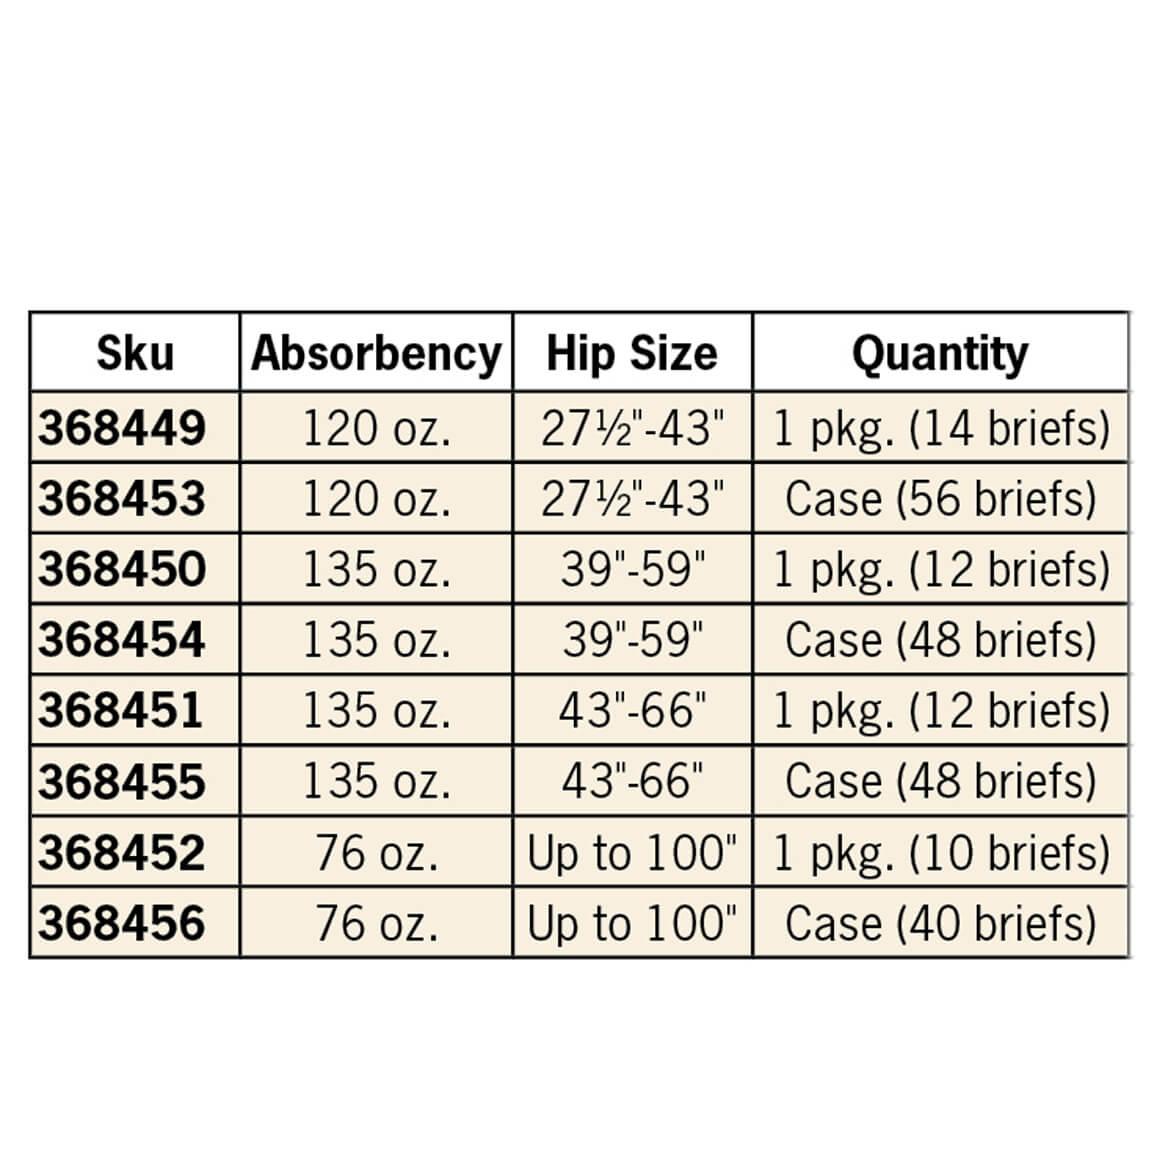 Abri-Form™ 135oz. Premium Adult Briefs XL, Case of 48    XL-368455